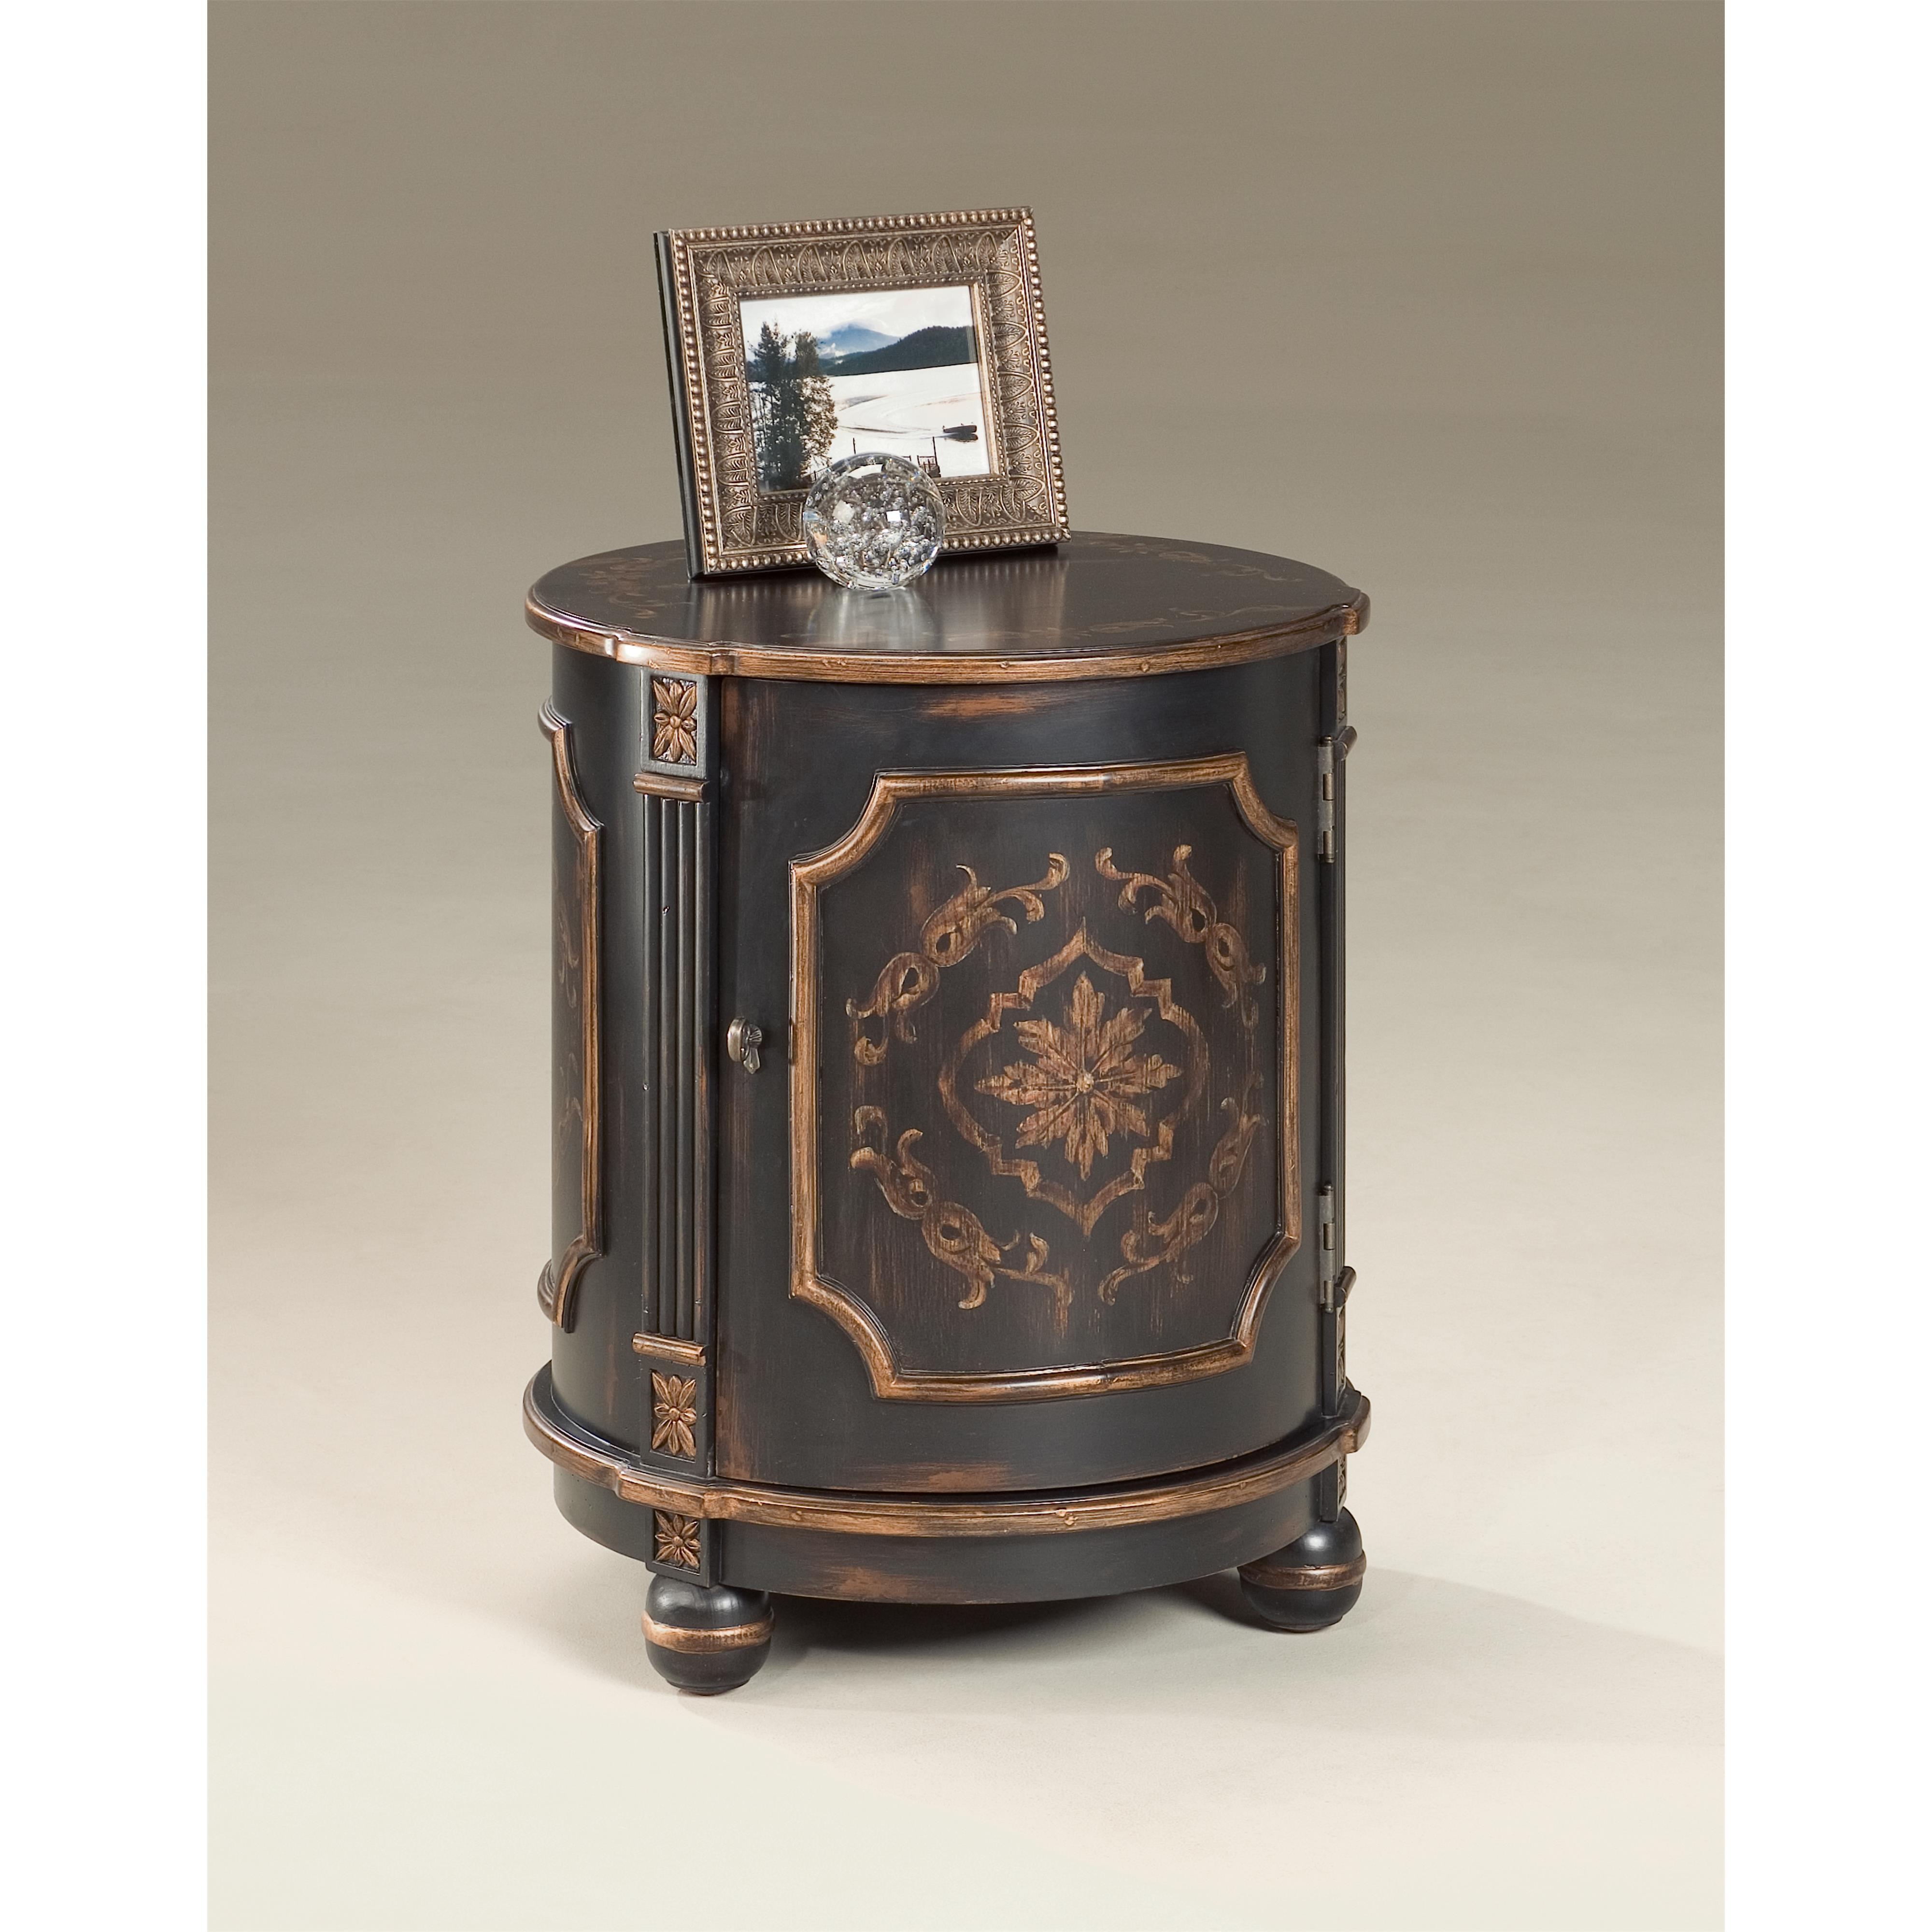 Butler Specialty Company Artist's Originals Drum Table - Item Number: 584177